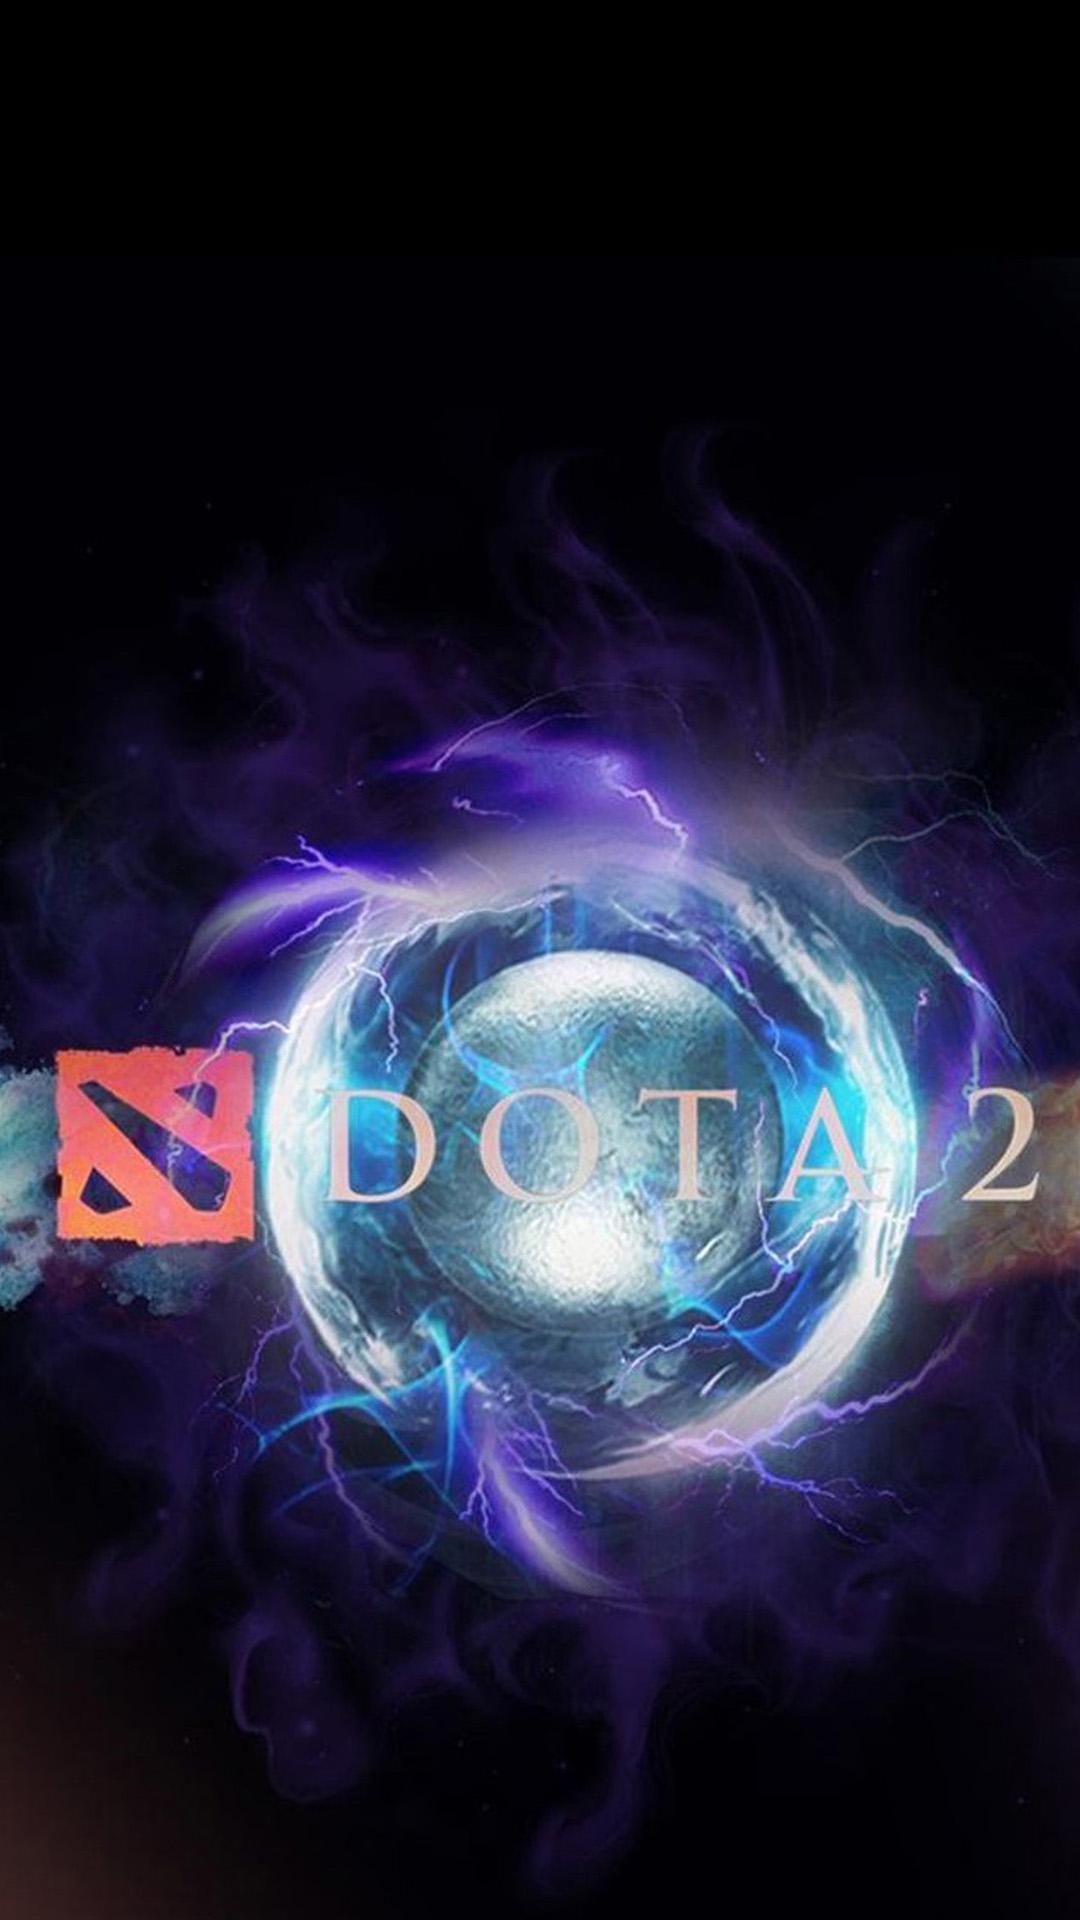 Dota 2 Logo Wallpaper Posted By Samantha Tremblay